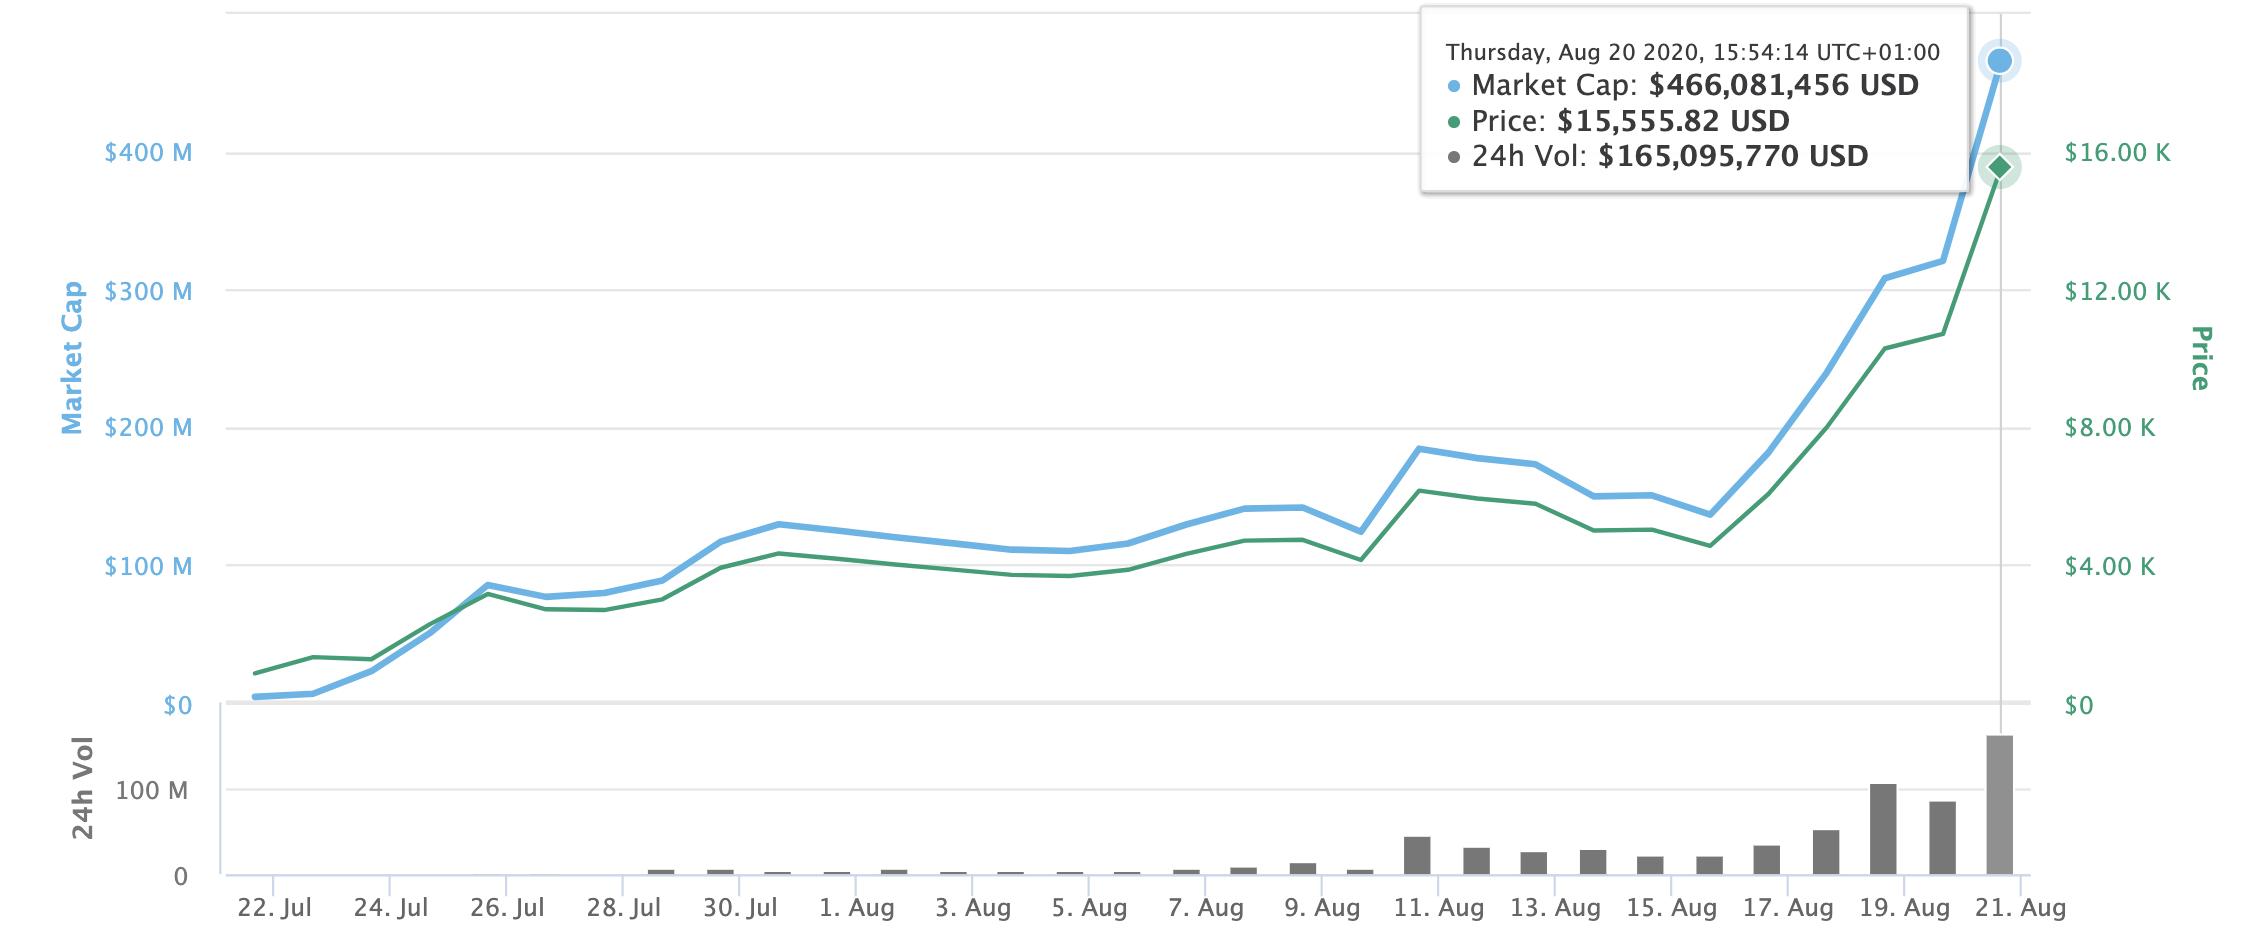 YFI price and market cap, Aug 2020